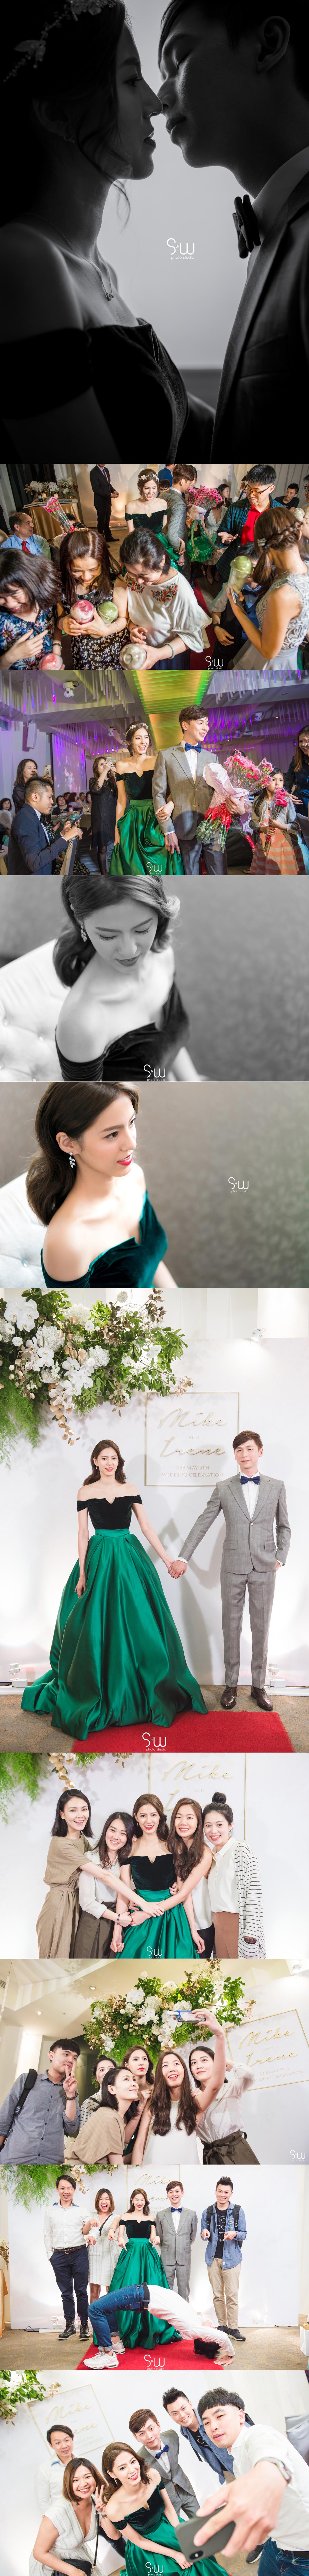 WEDDING | 內湖水源會館 文定 Taipei | sw photo studio 婚禮, 婚攝, 婚紗, 海外婚禮, 海外婚紗, 海島婚禮,峇里島婚禮, 峇里島婚紗, 台灣婚禮, 婚攝推薦